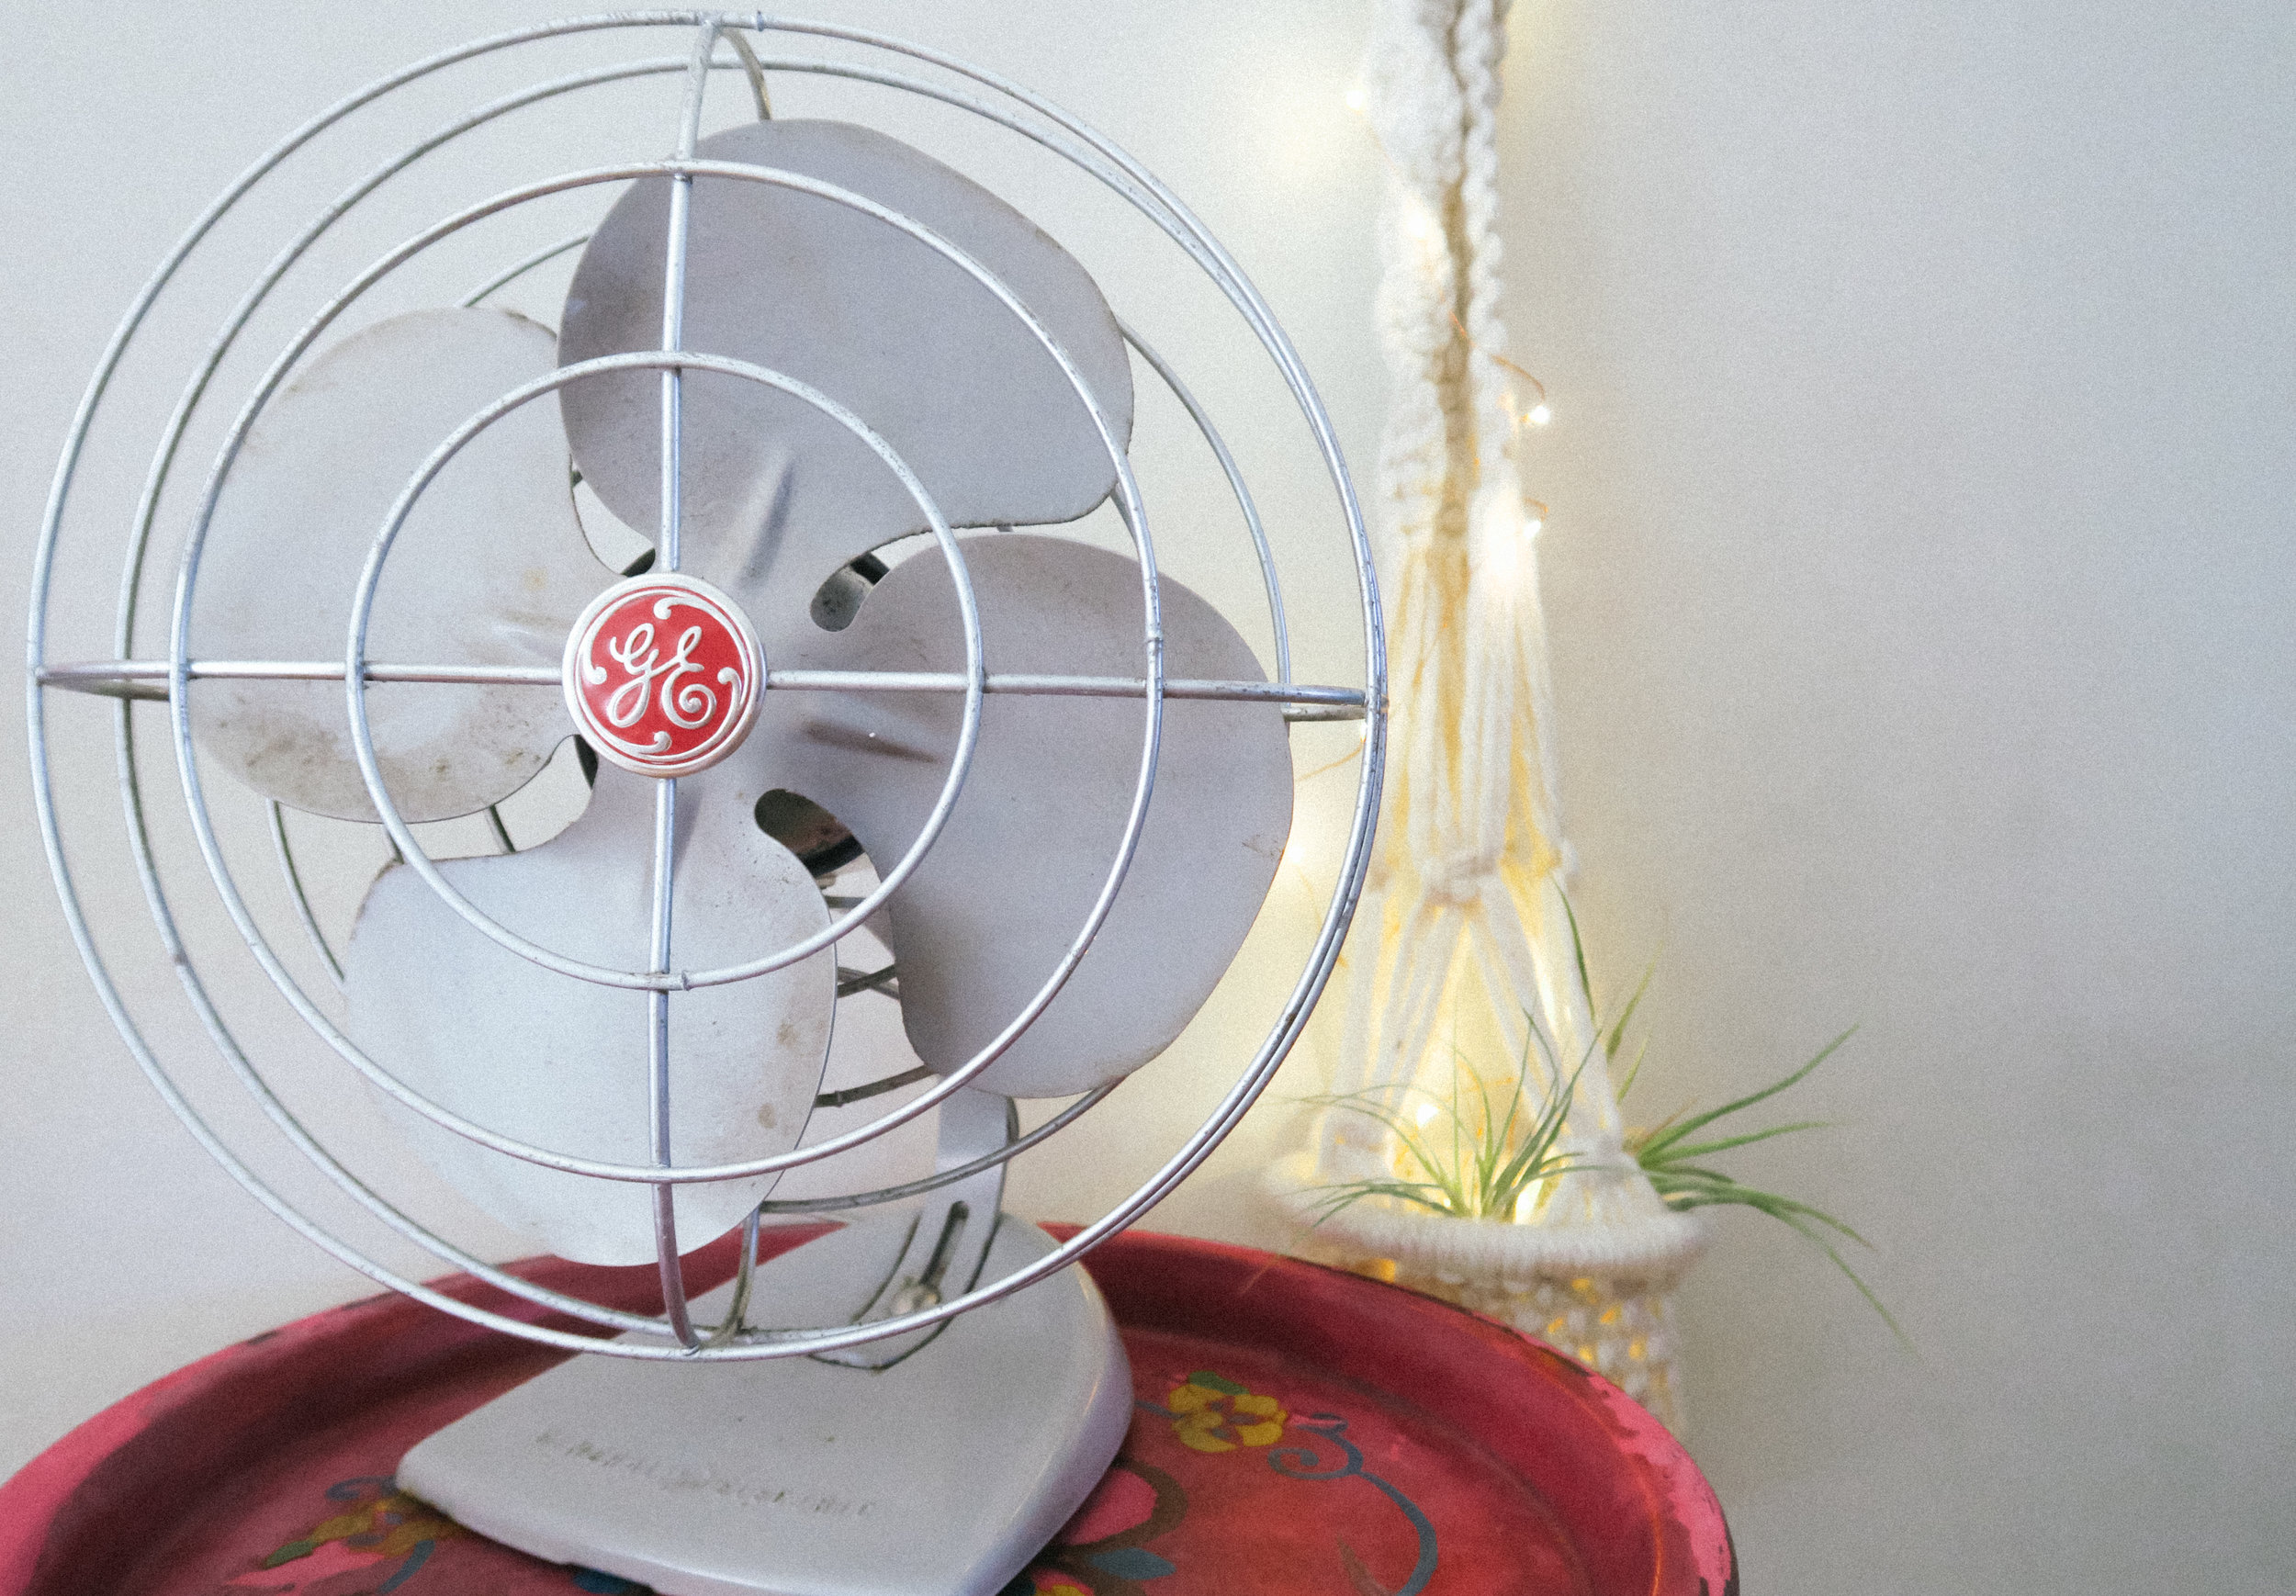 vintage GE fan from  lounge lizard, macrame plant hanger from the  garage sale warehouse